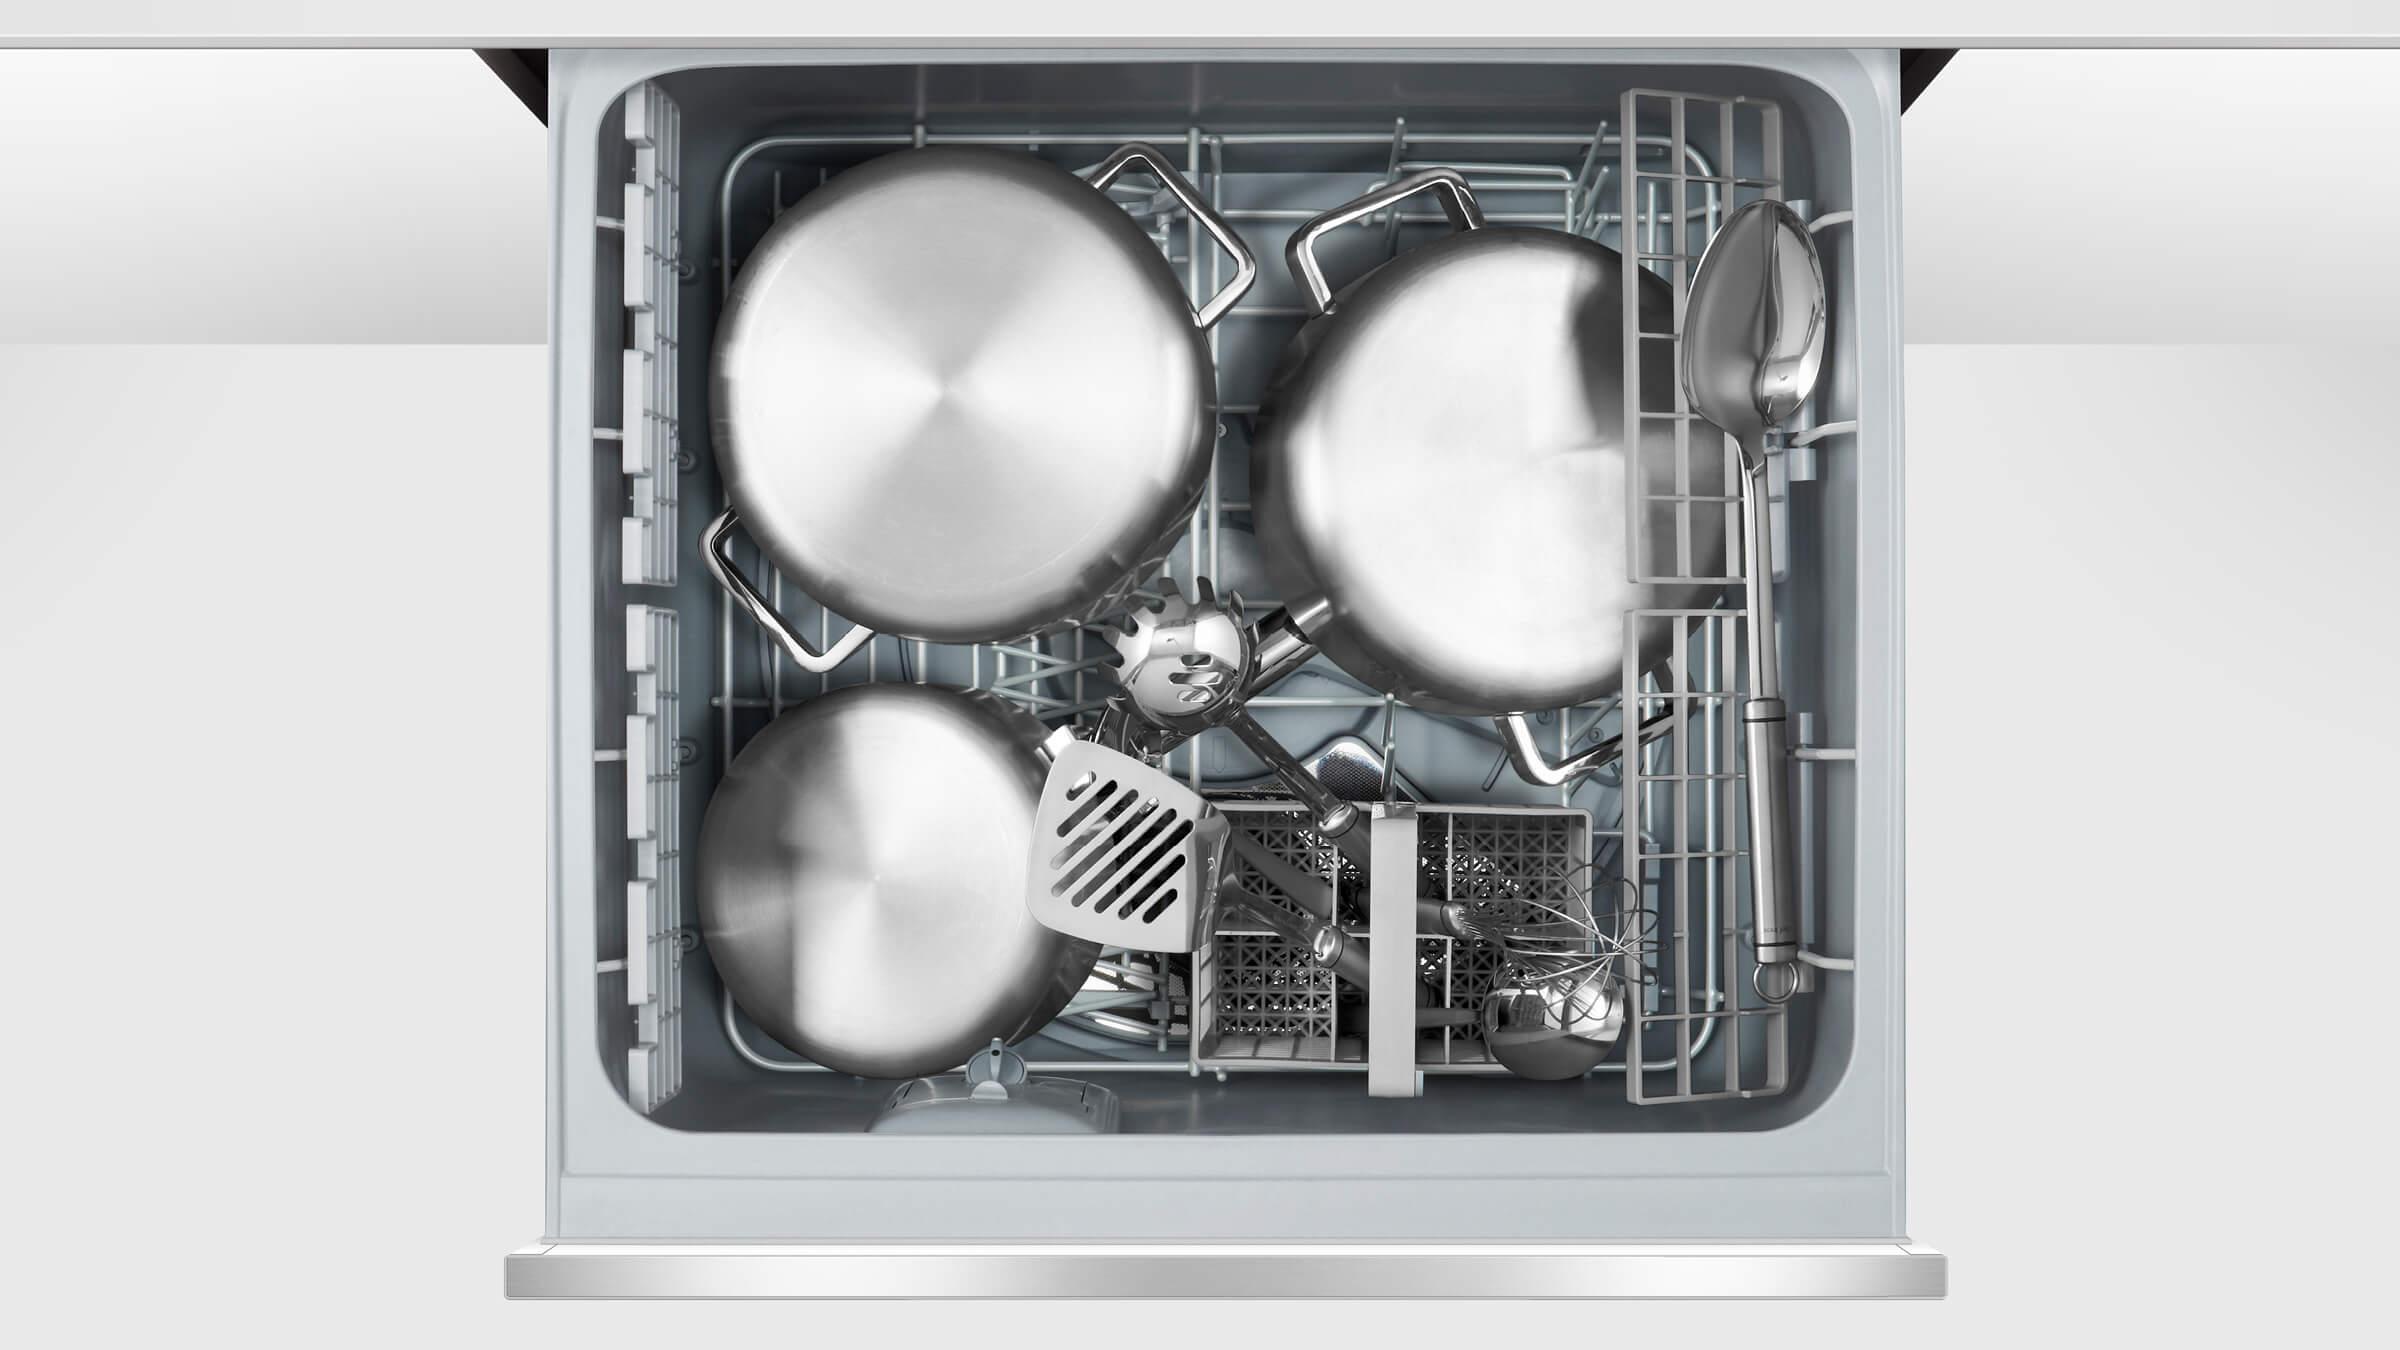 Tall Single DishDrawer dishwasher incl Santize, Extra Dry and full flex racking